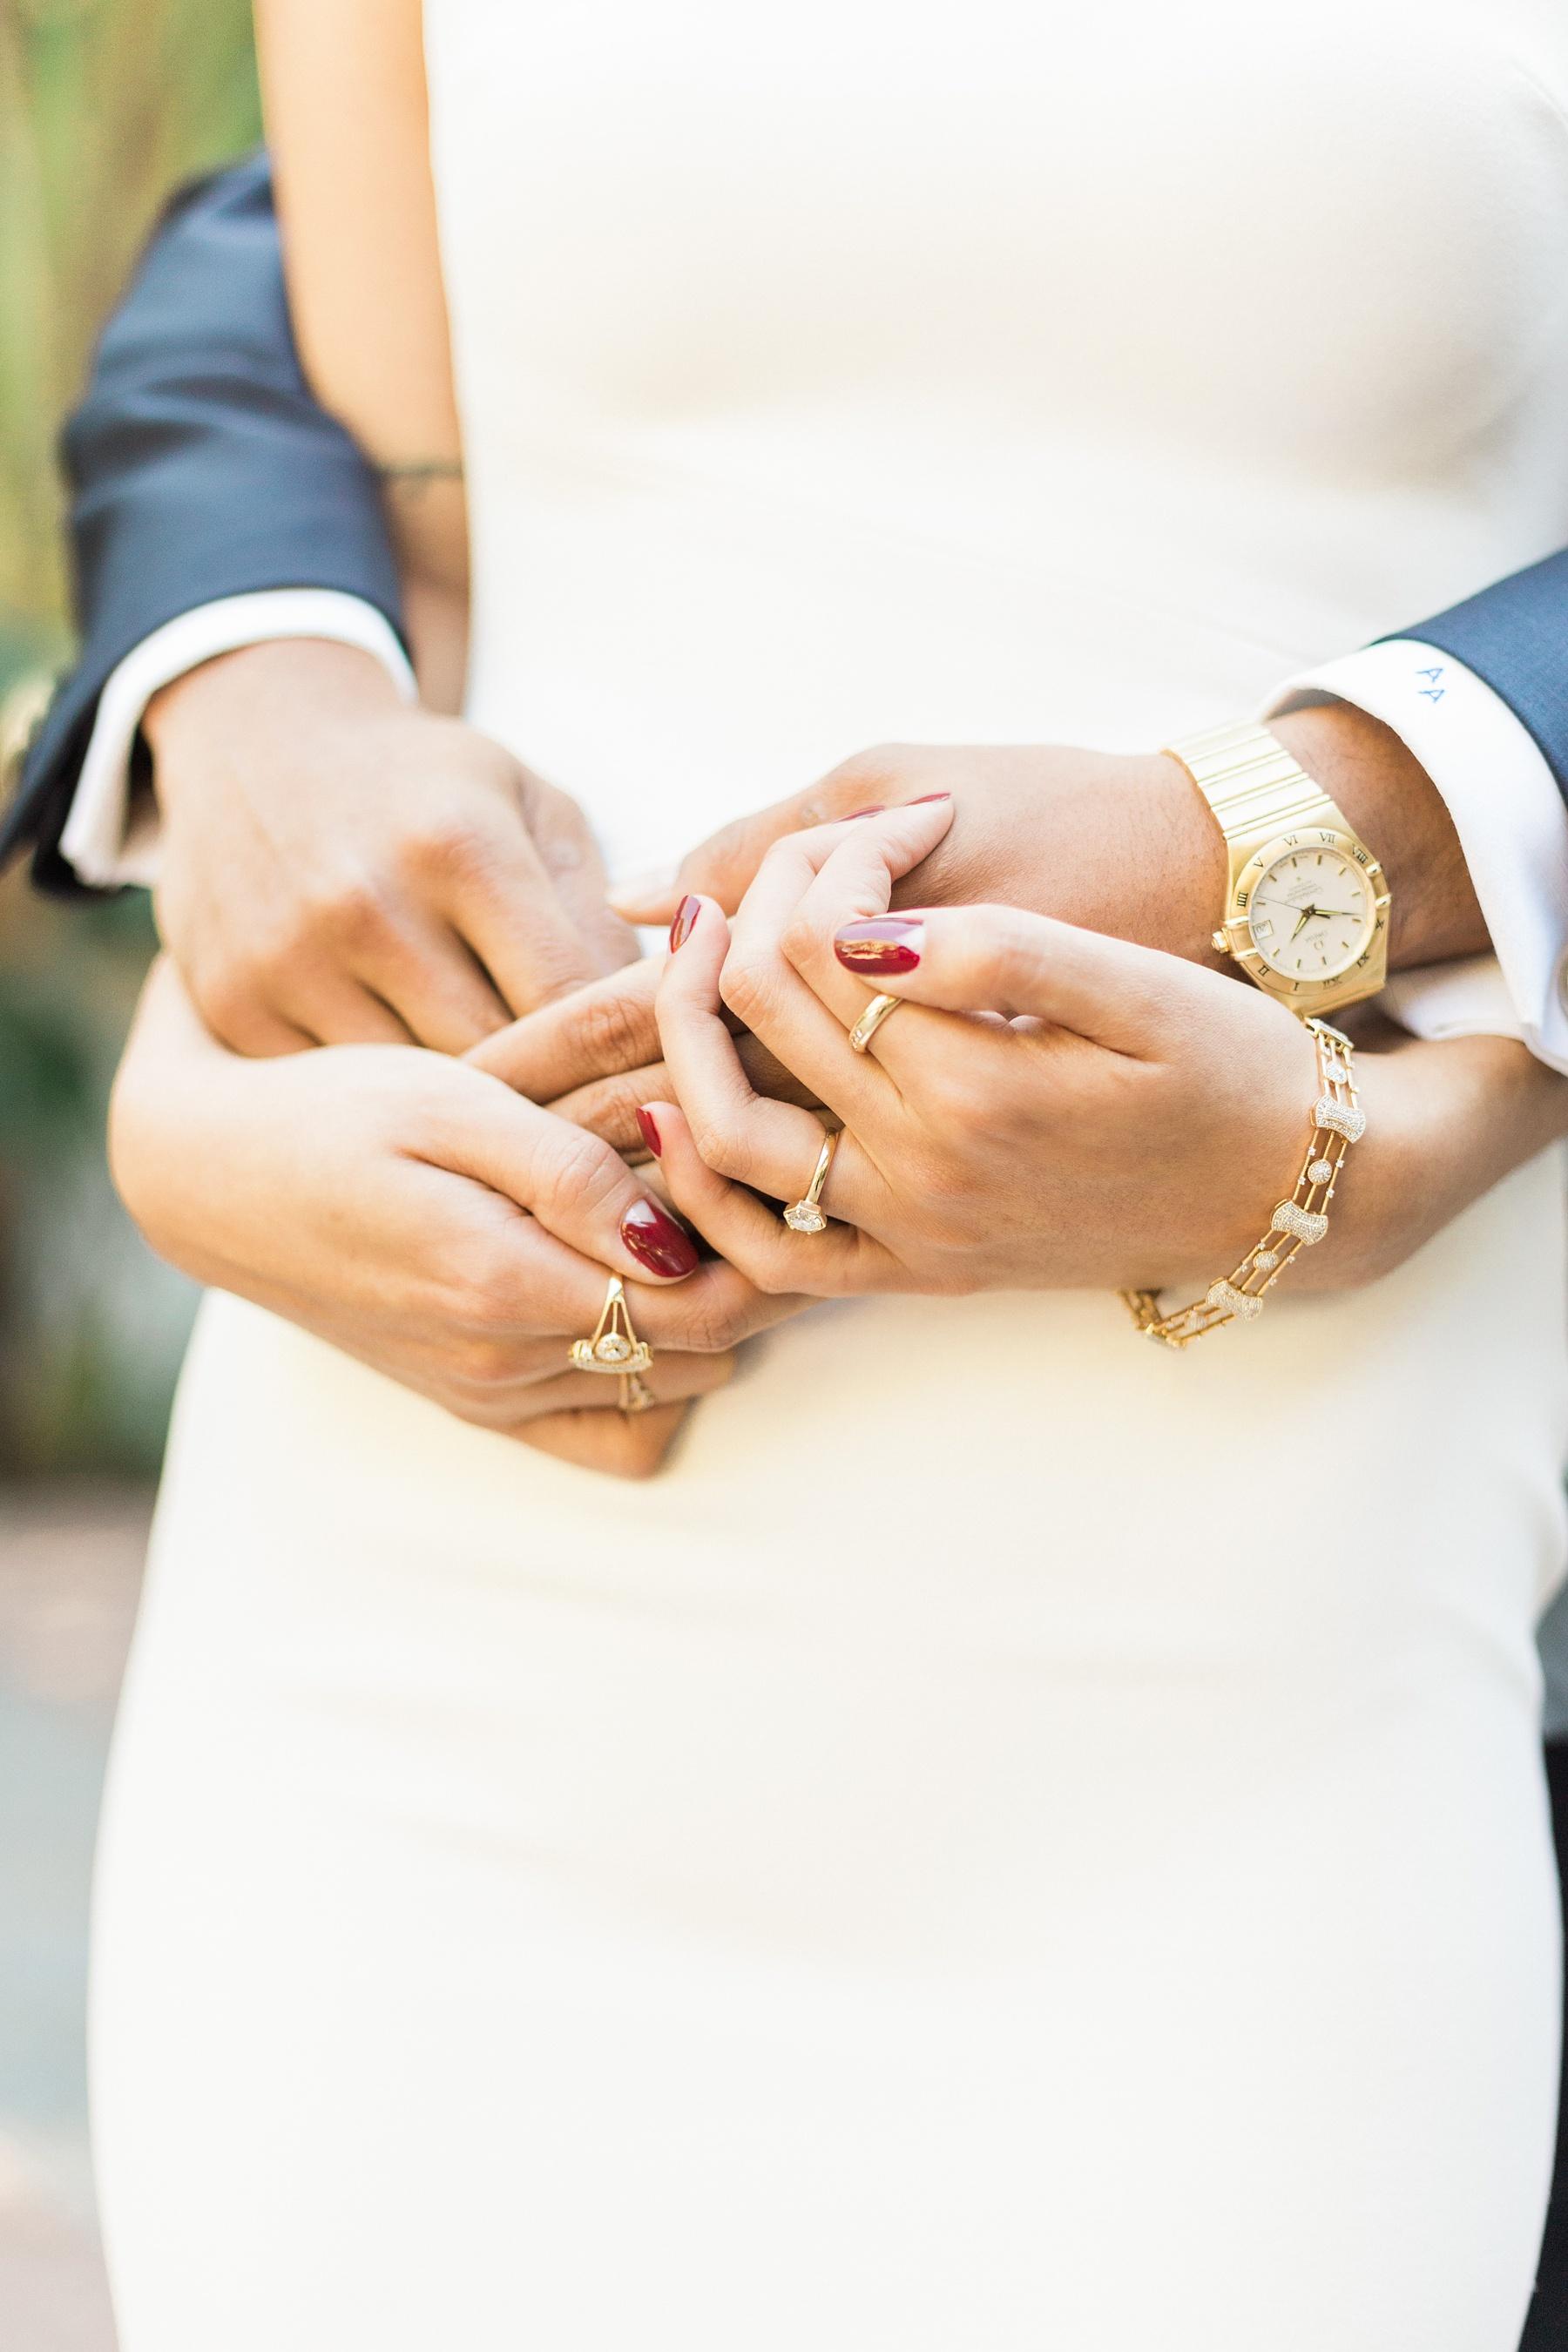 Urban DTLA Wedding at Millwick By Wedding Photographer Madison Ellis (59)